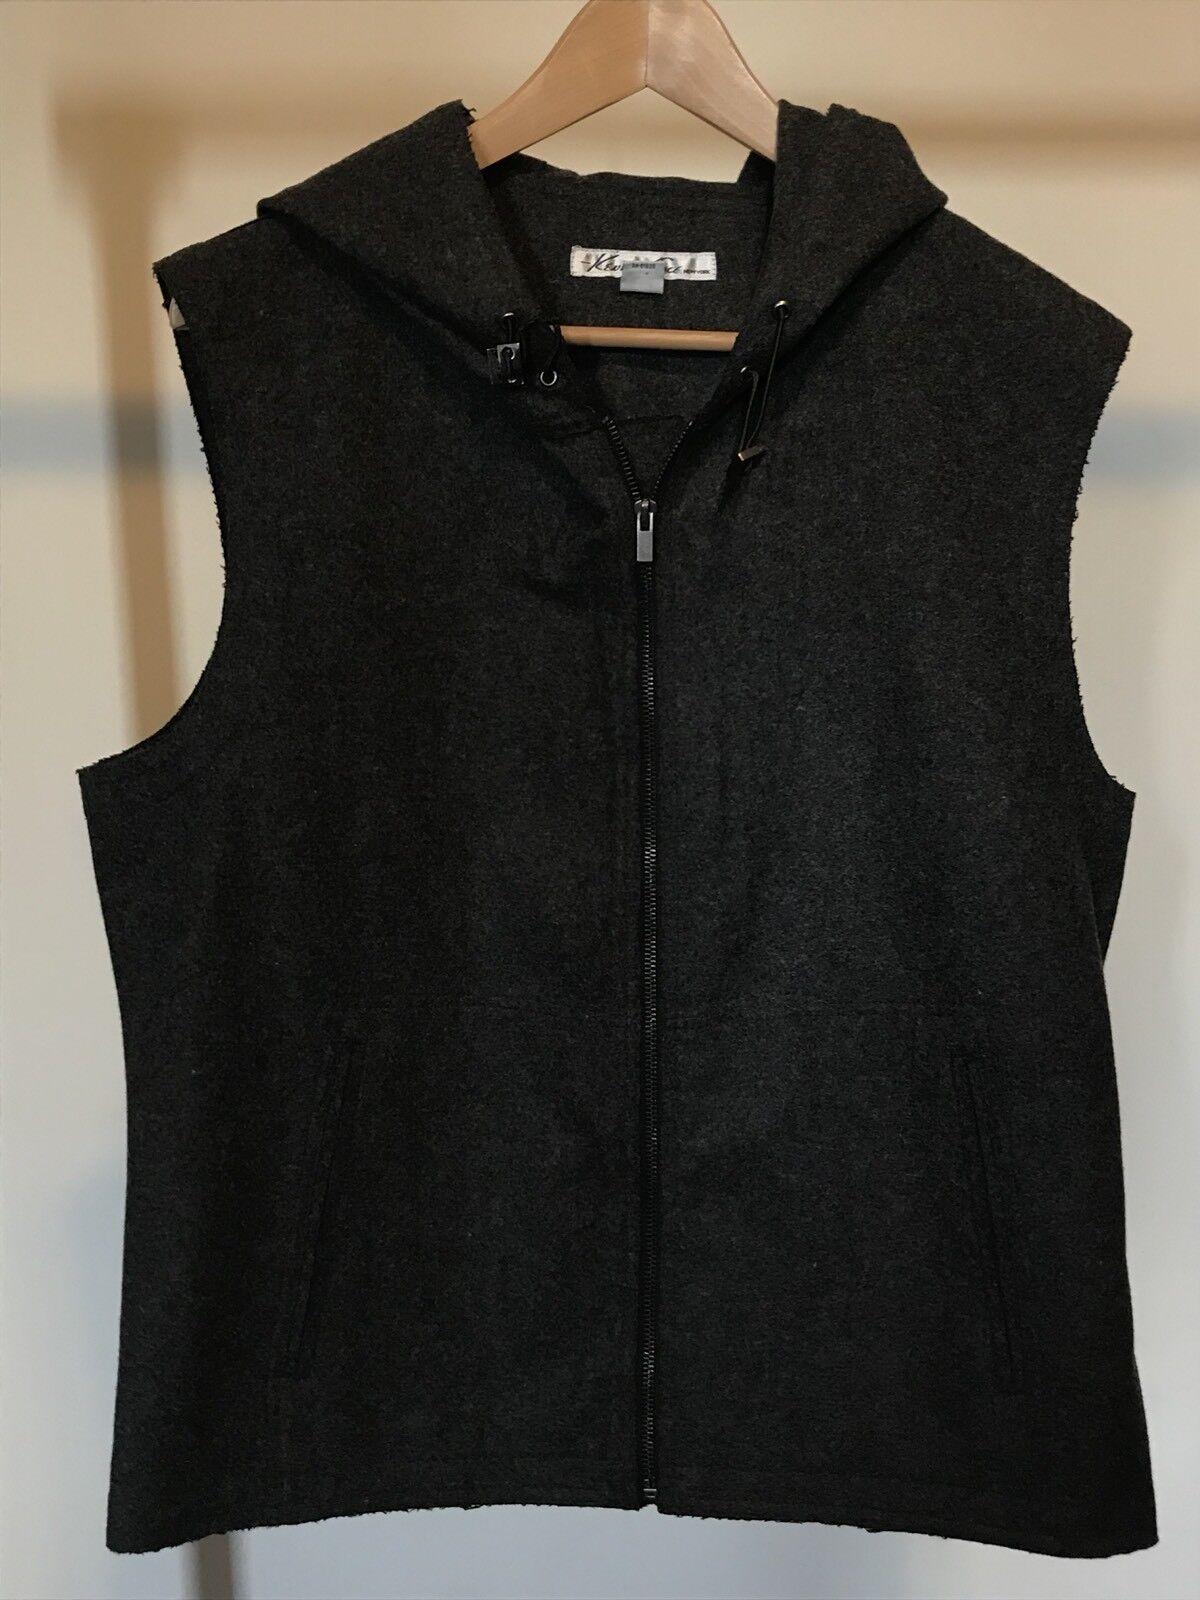 Kenneth Cole Men's grau Zip Up Hooded Vest